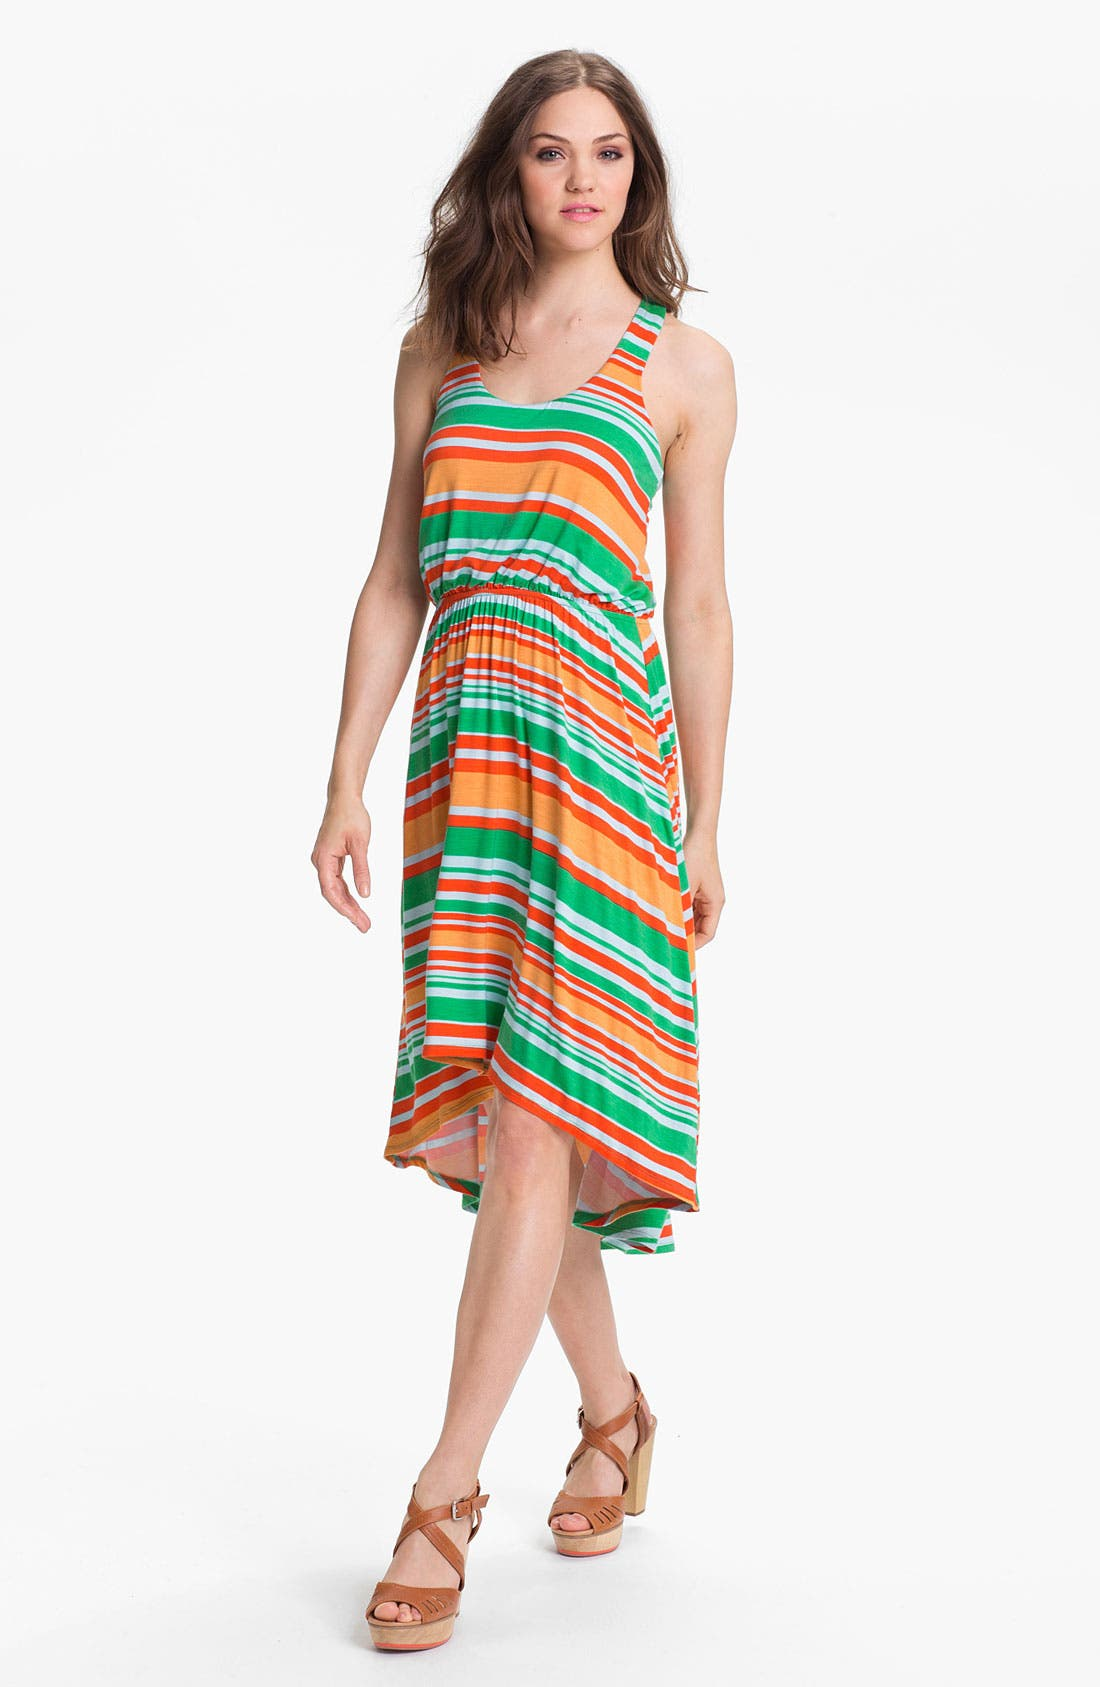 Alternate Image 1 Selected - Bobeau Racerback High/Low Dress